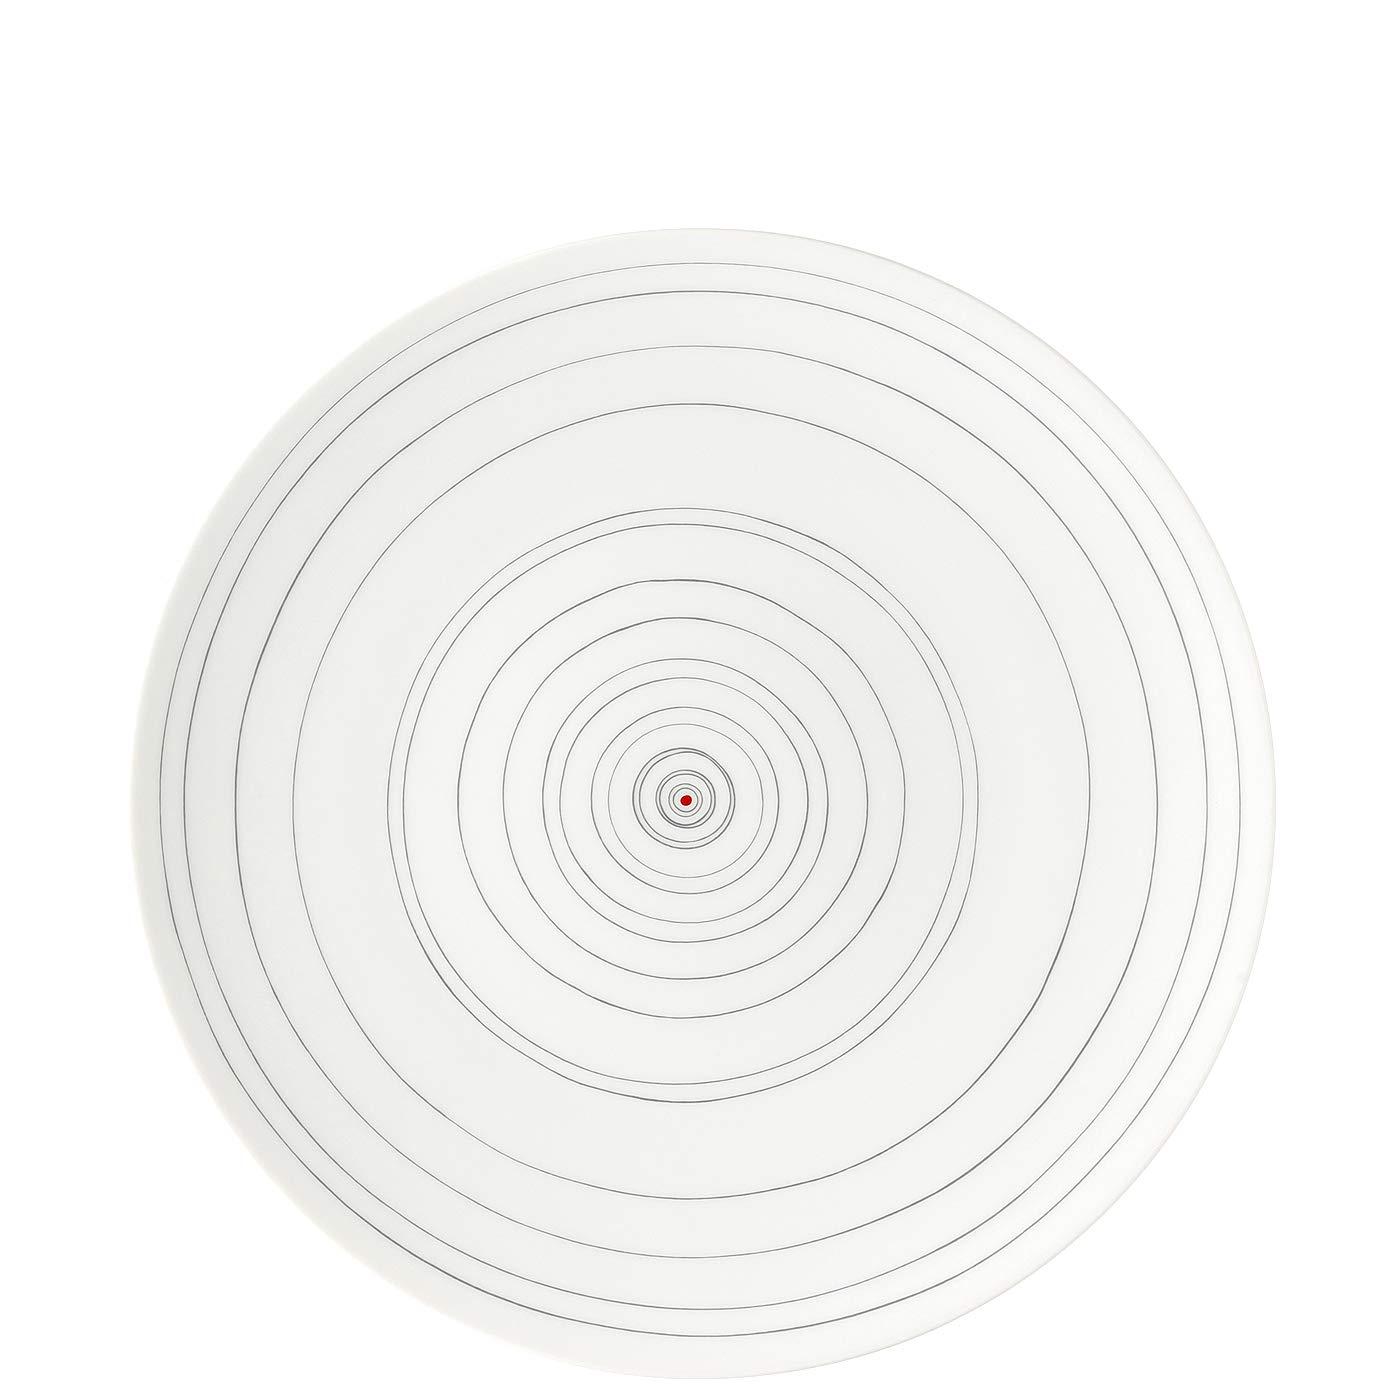 Rosanthal Rosanthal Rosanthal TAC Gropius Stripes 2.0 Speiseteller 28 cm 11280-403261-10229 B07P9FS1FW Hobel & Reiben d58c7c